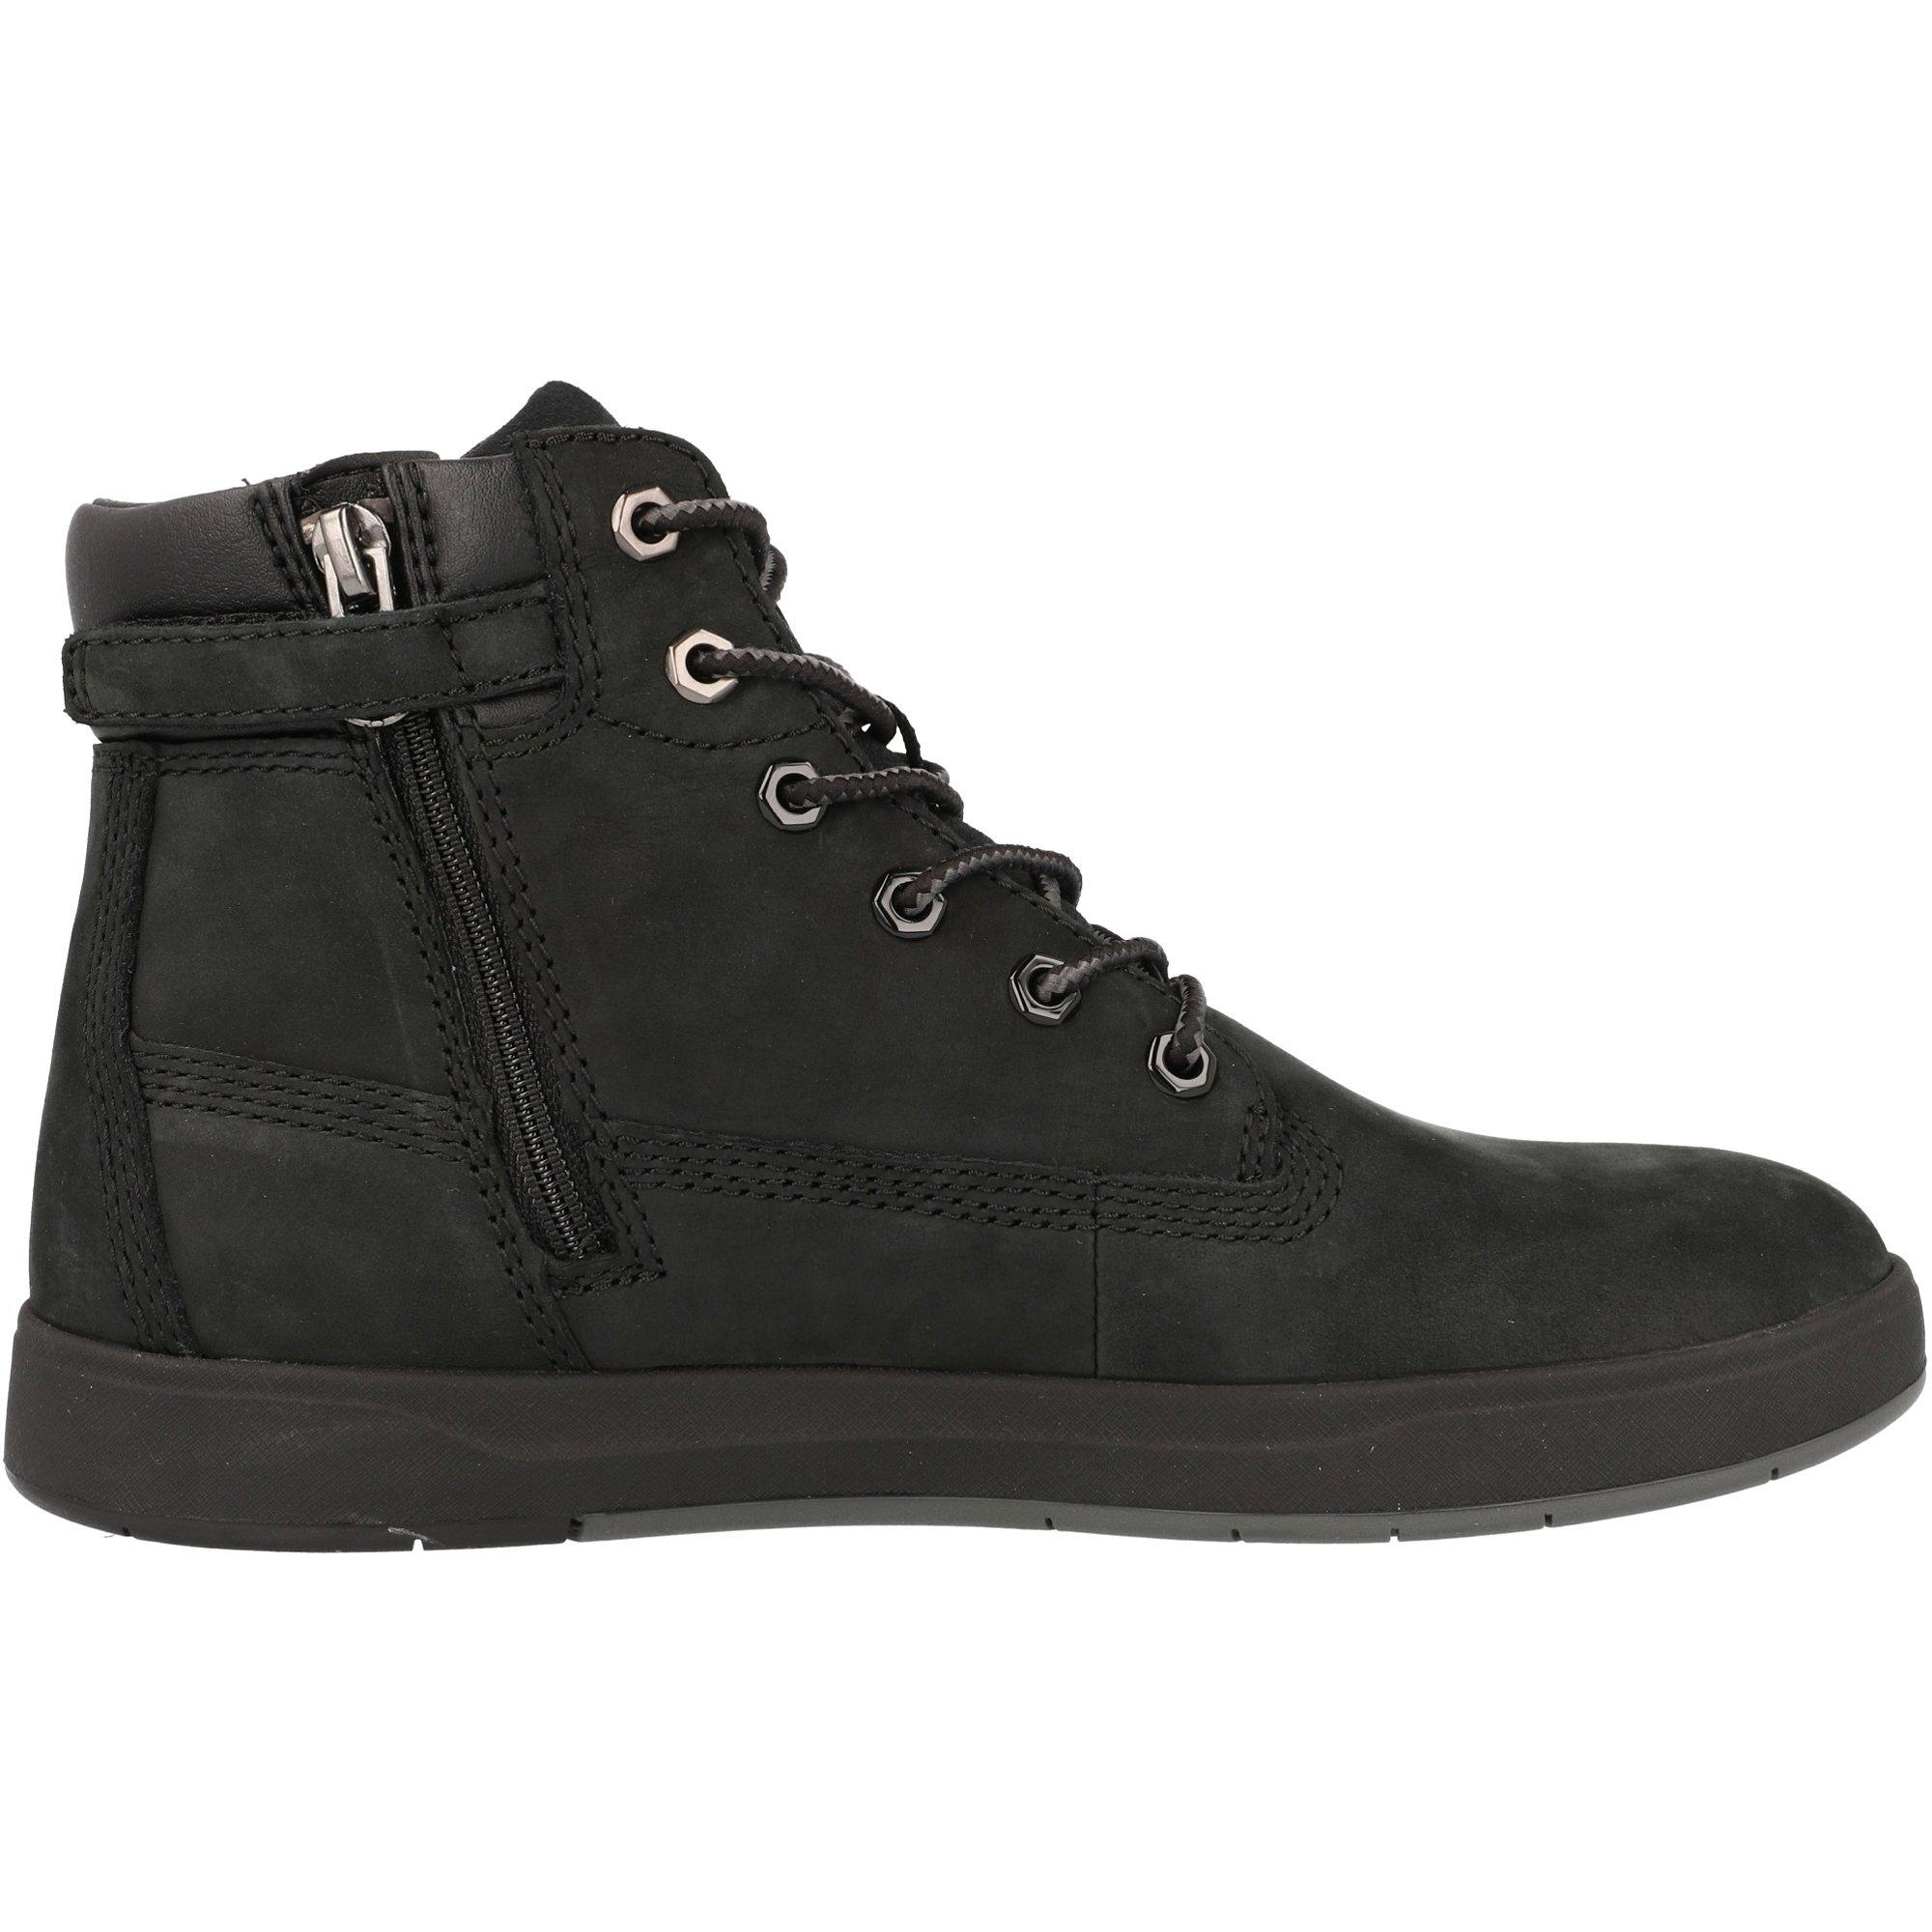 Timberland Davis Square 6 Inch Boot J Black Nubuck